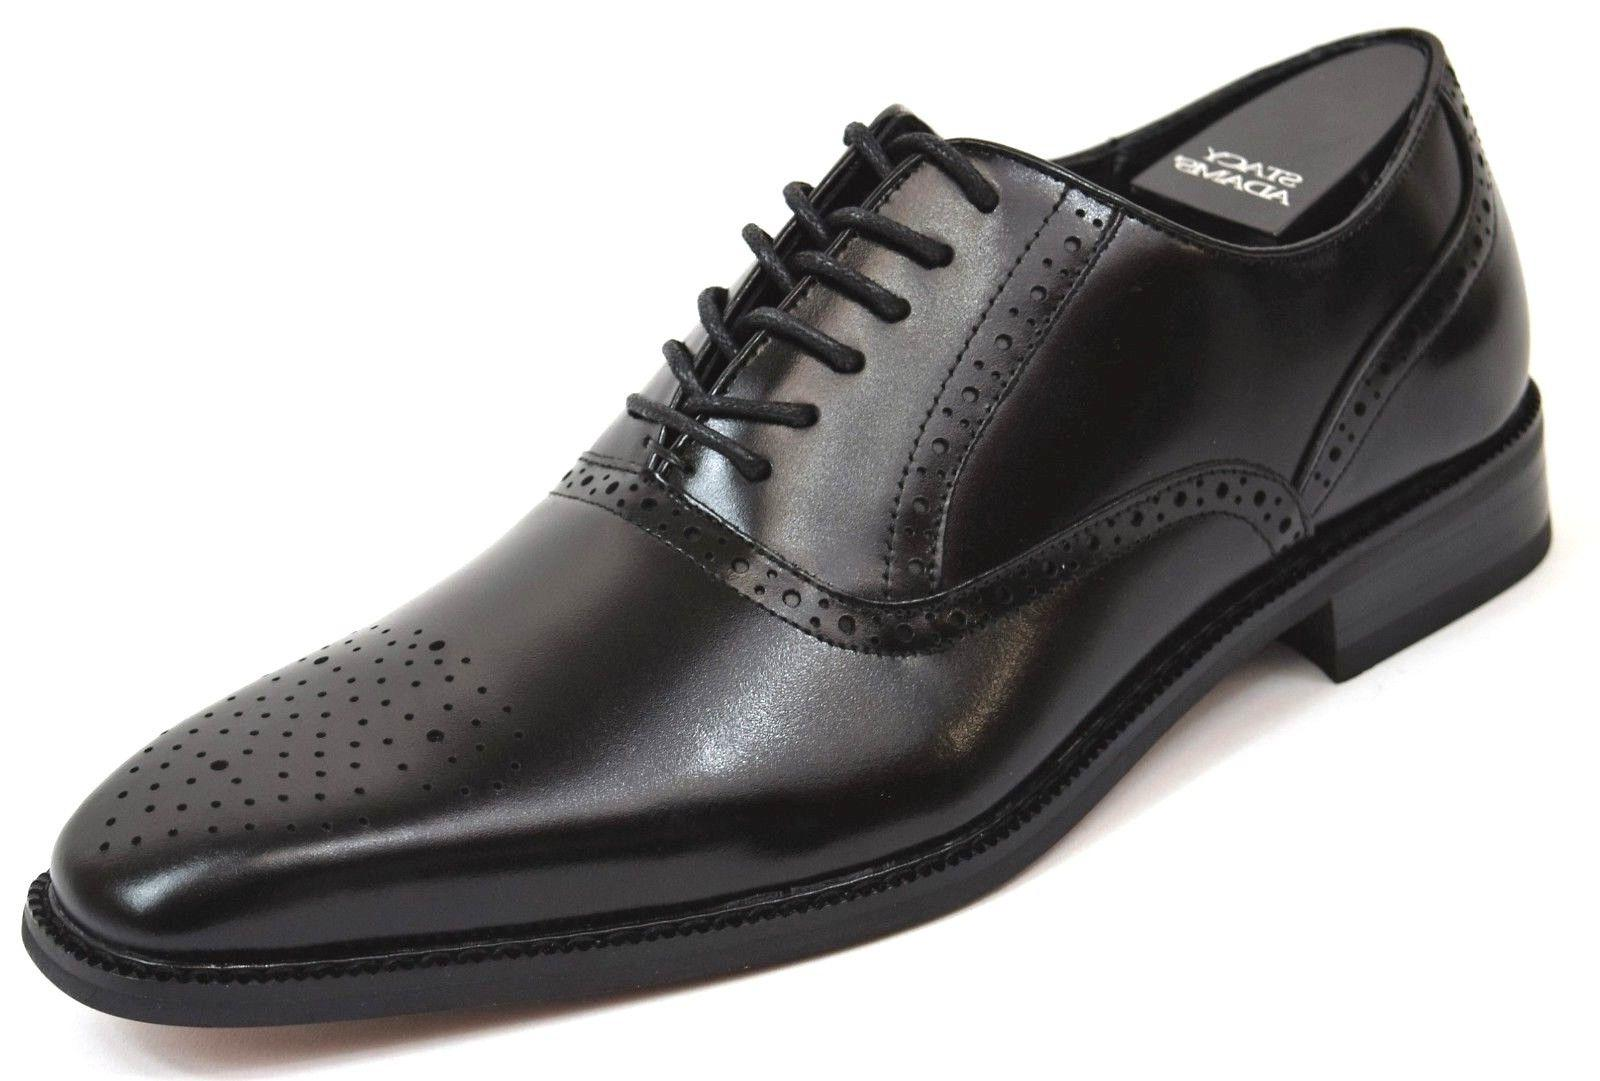 Men's Dress Shoes Plain Toe Oxford Solid Black Leather BISHO